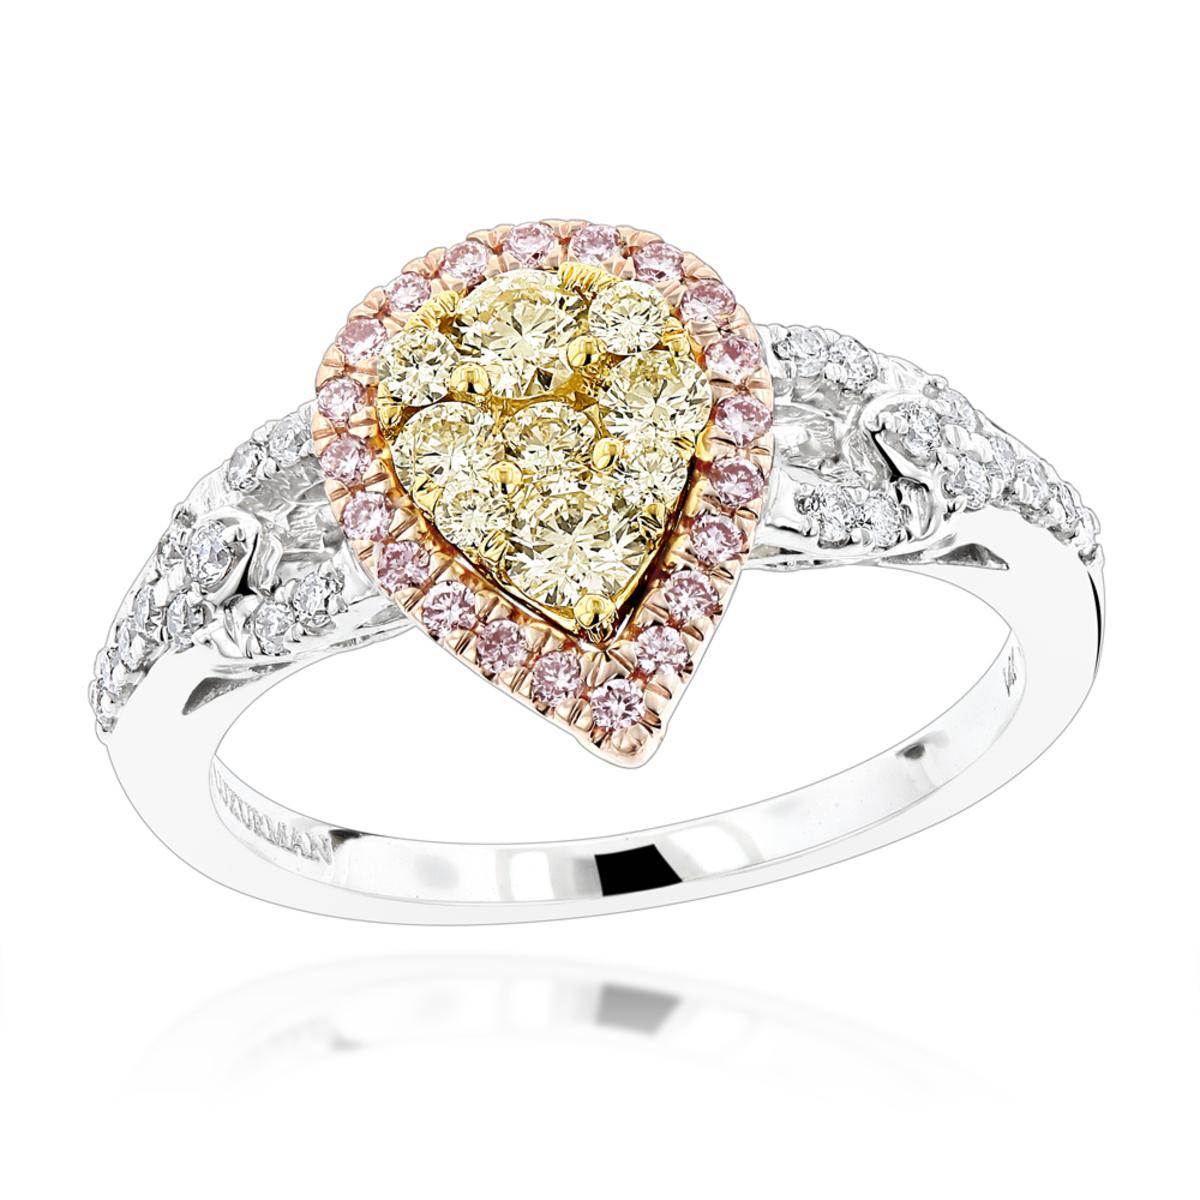 14K Gold White Pink Yellow Diamond Engagement Ring for Women Pear Shape